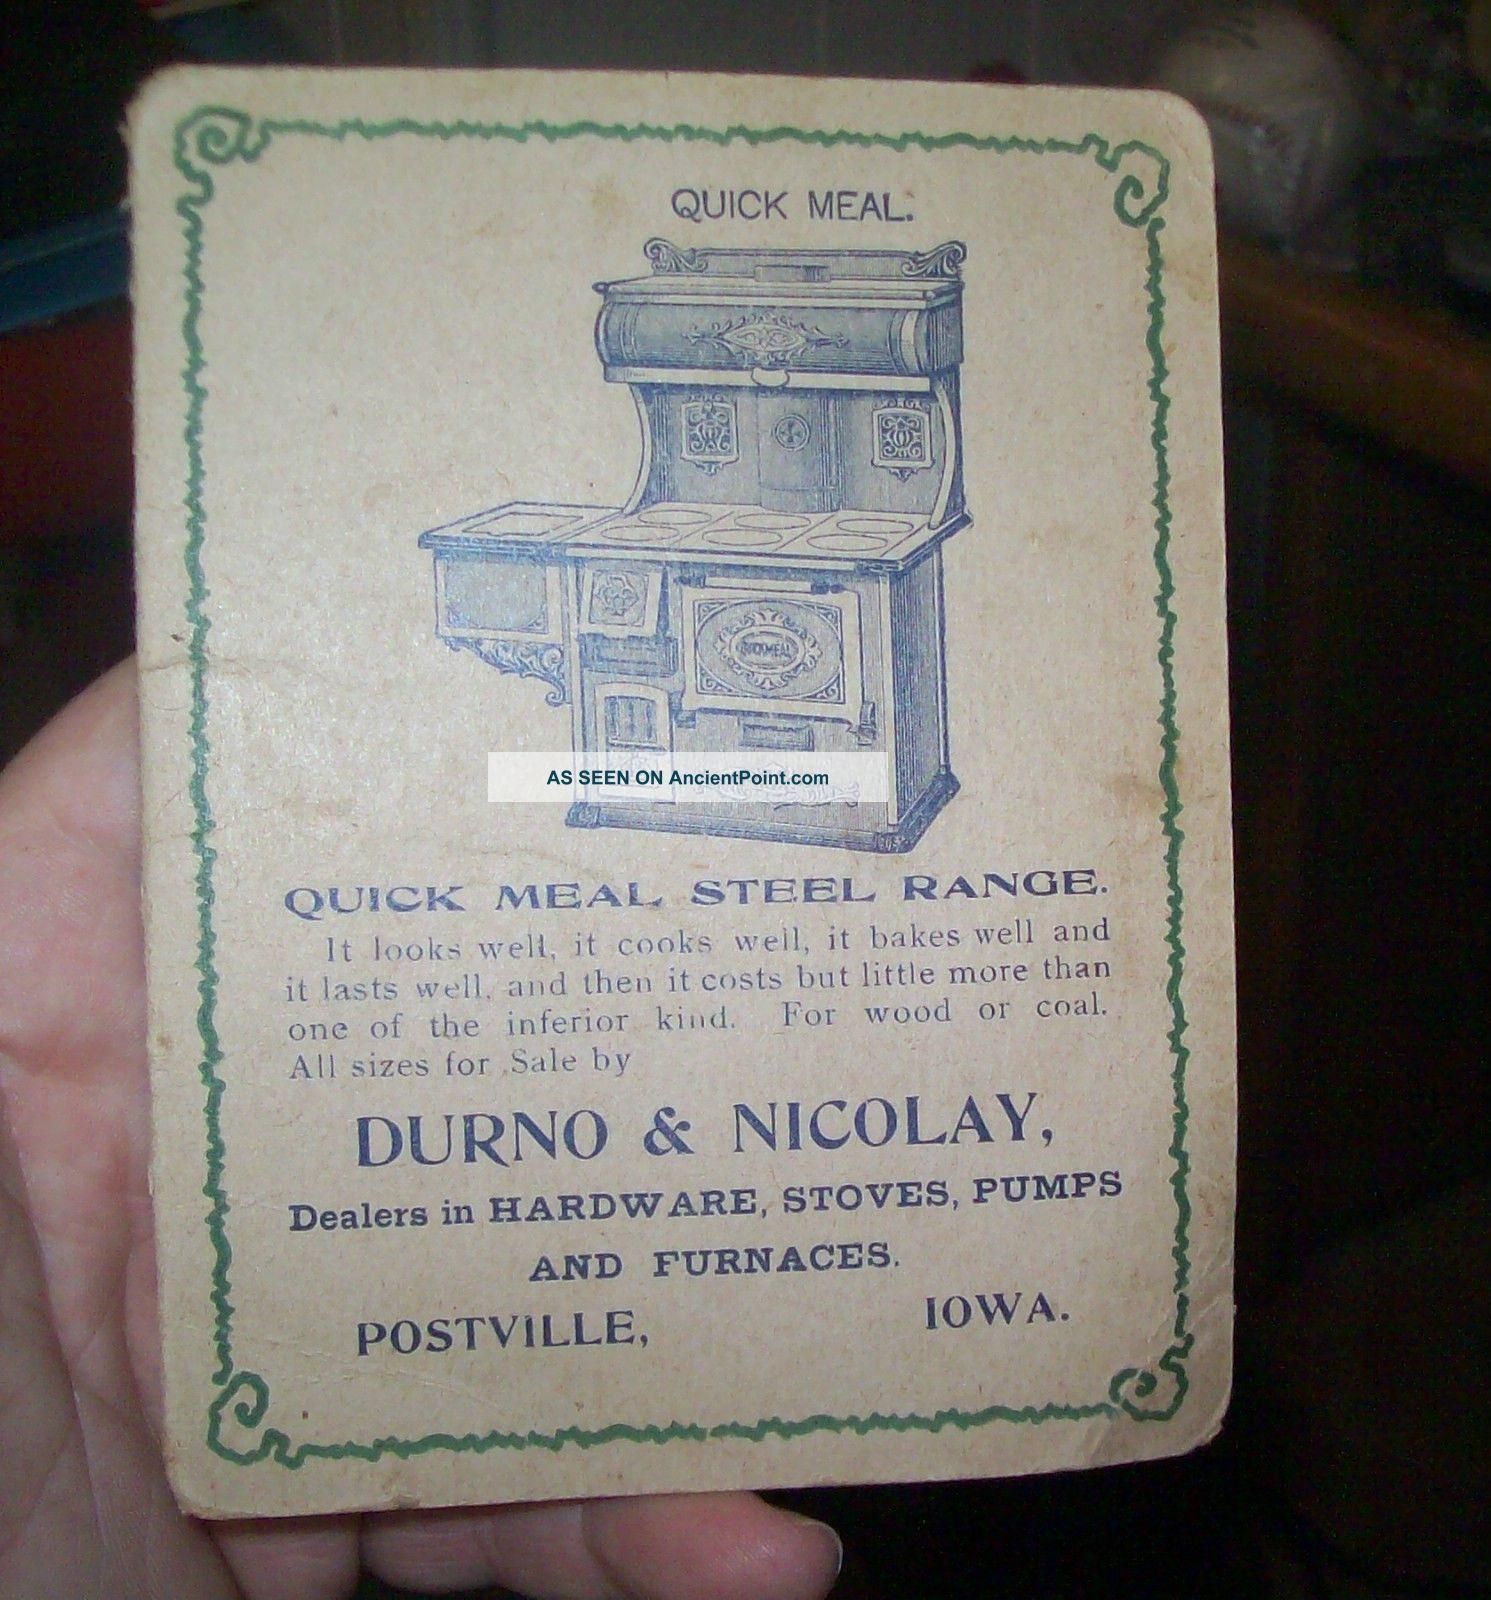 1905 Durno & Nicolay Hardware Stoves & Furnaces Sewing Needle Kit Postville,  Ia Needles & Cases photo